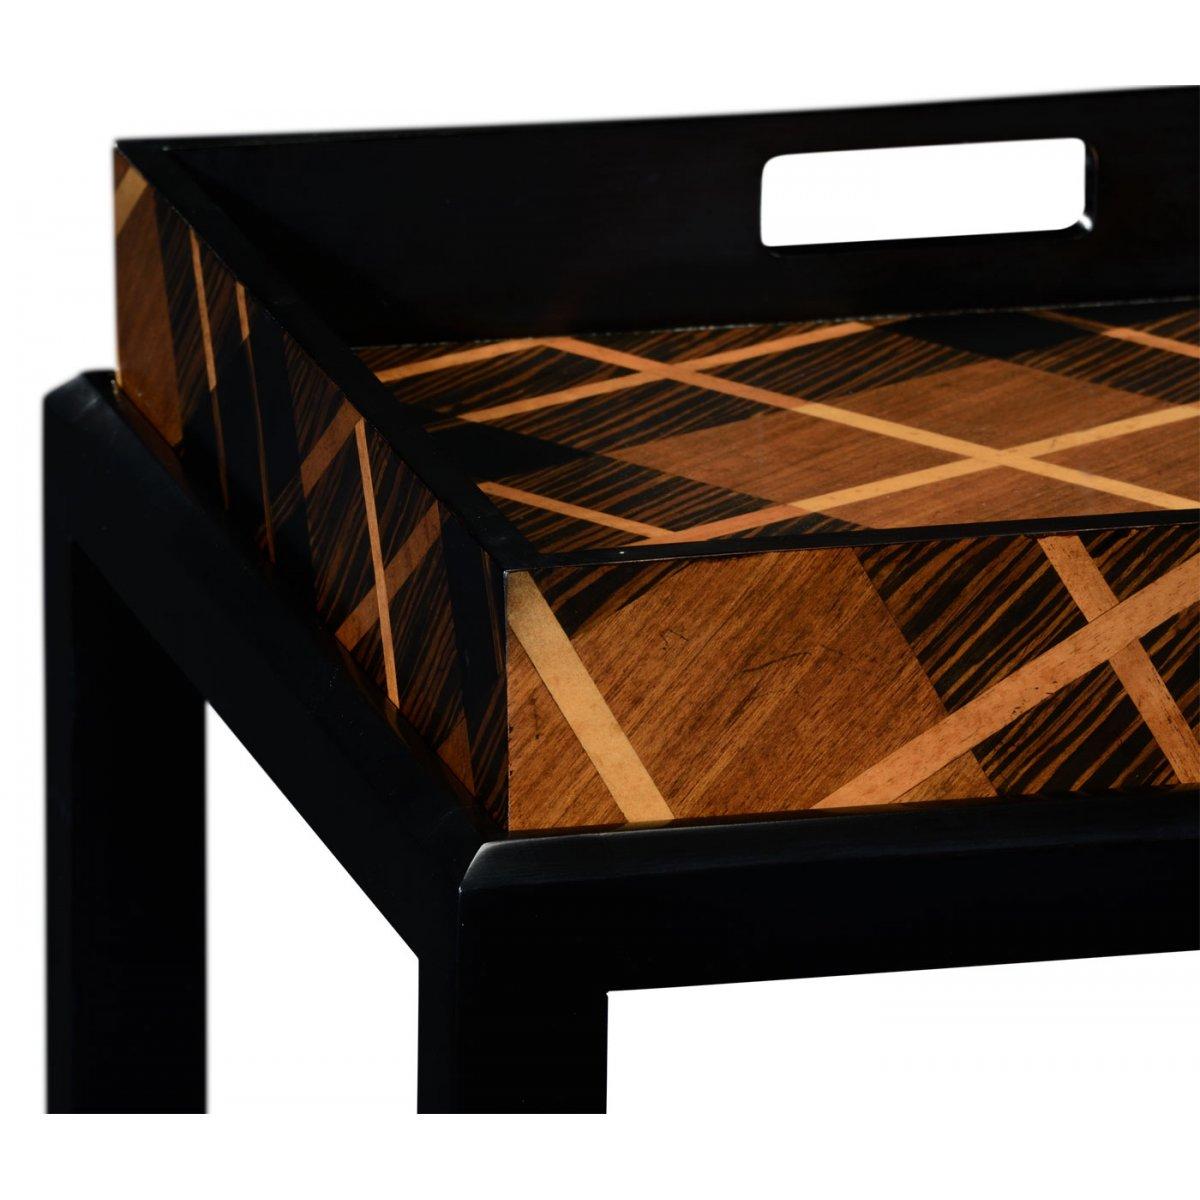 tray tables tartan butler trays swanky interiors alexander julian furniture tray tables tartan butler trays